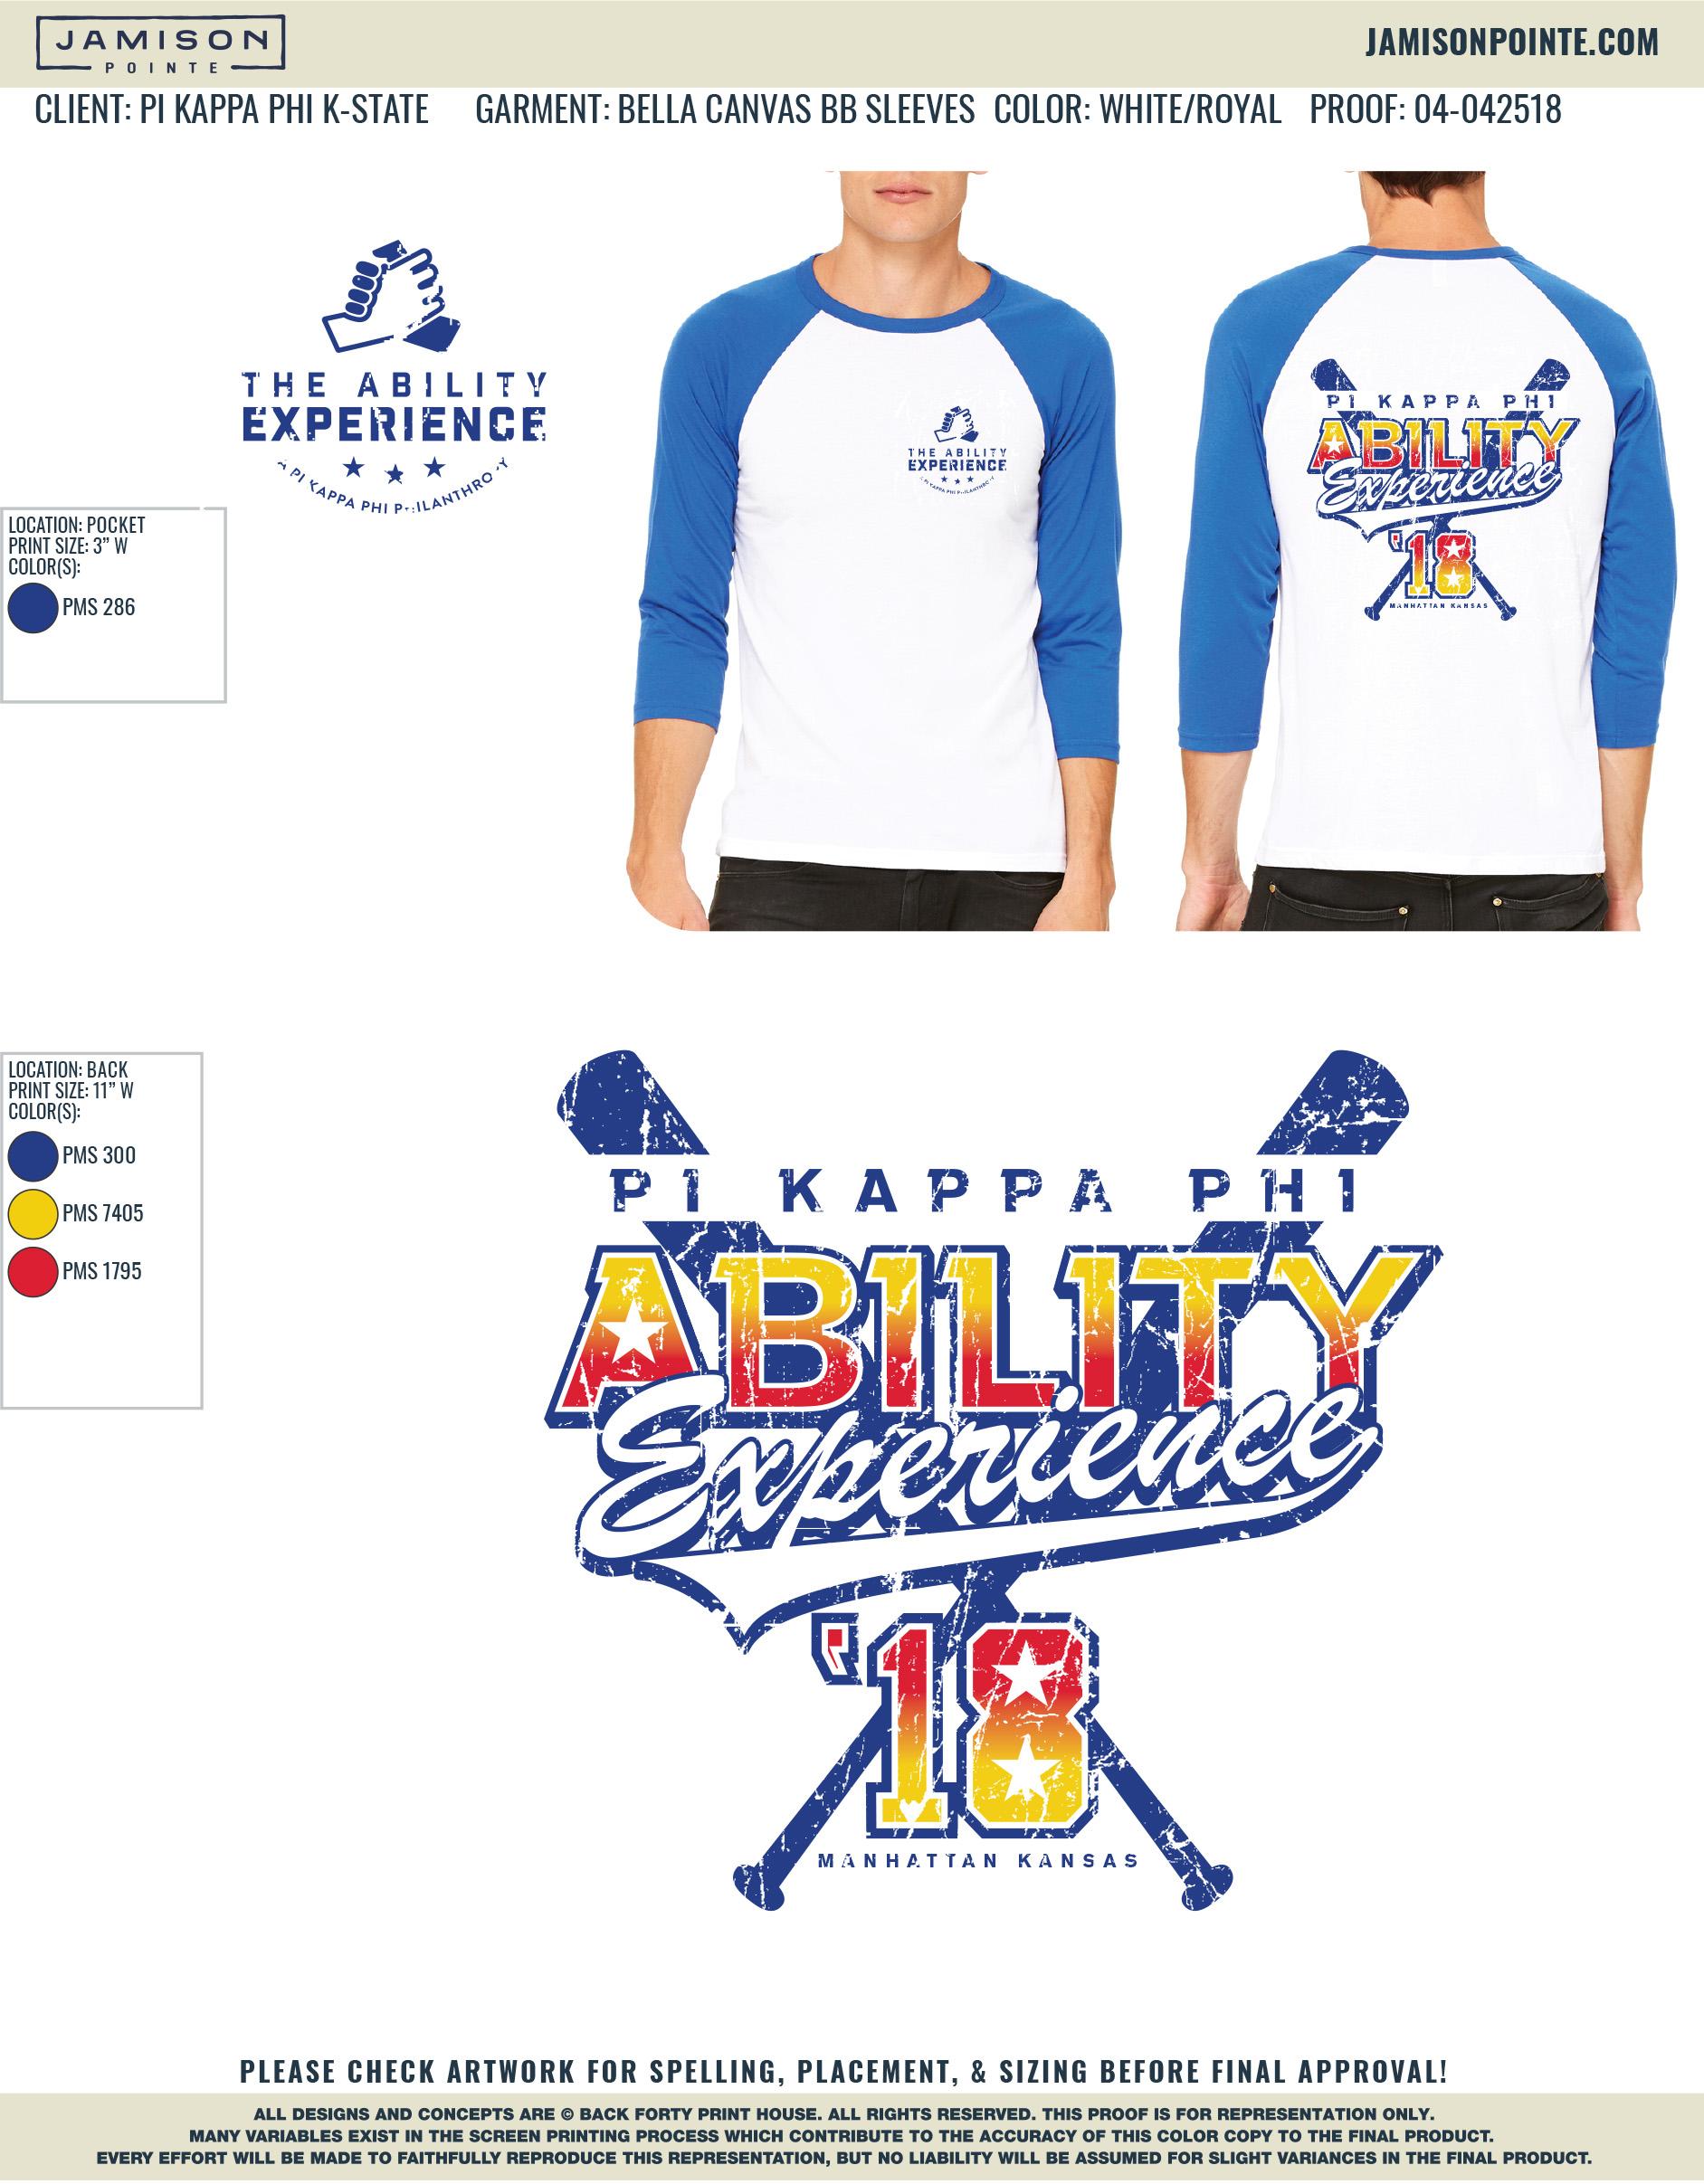 04-042518 Pi Kappa Phi Kansas State University Philanthropy 2018.jpg